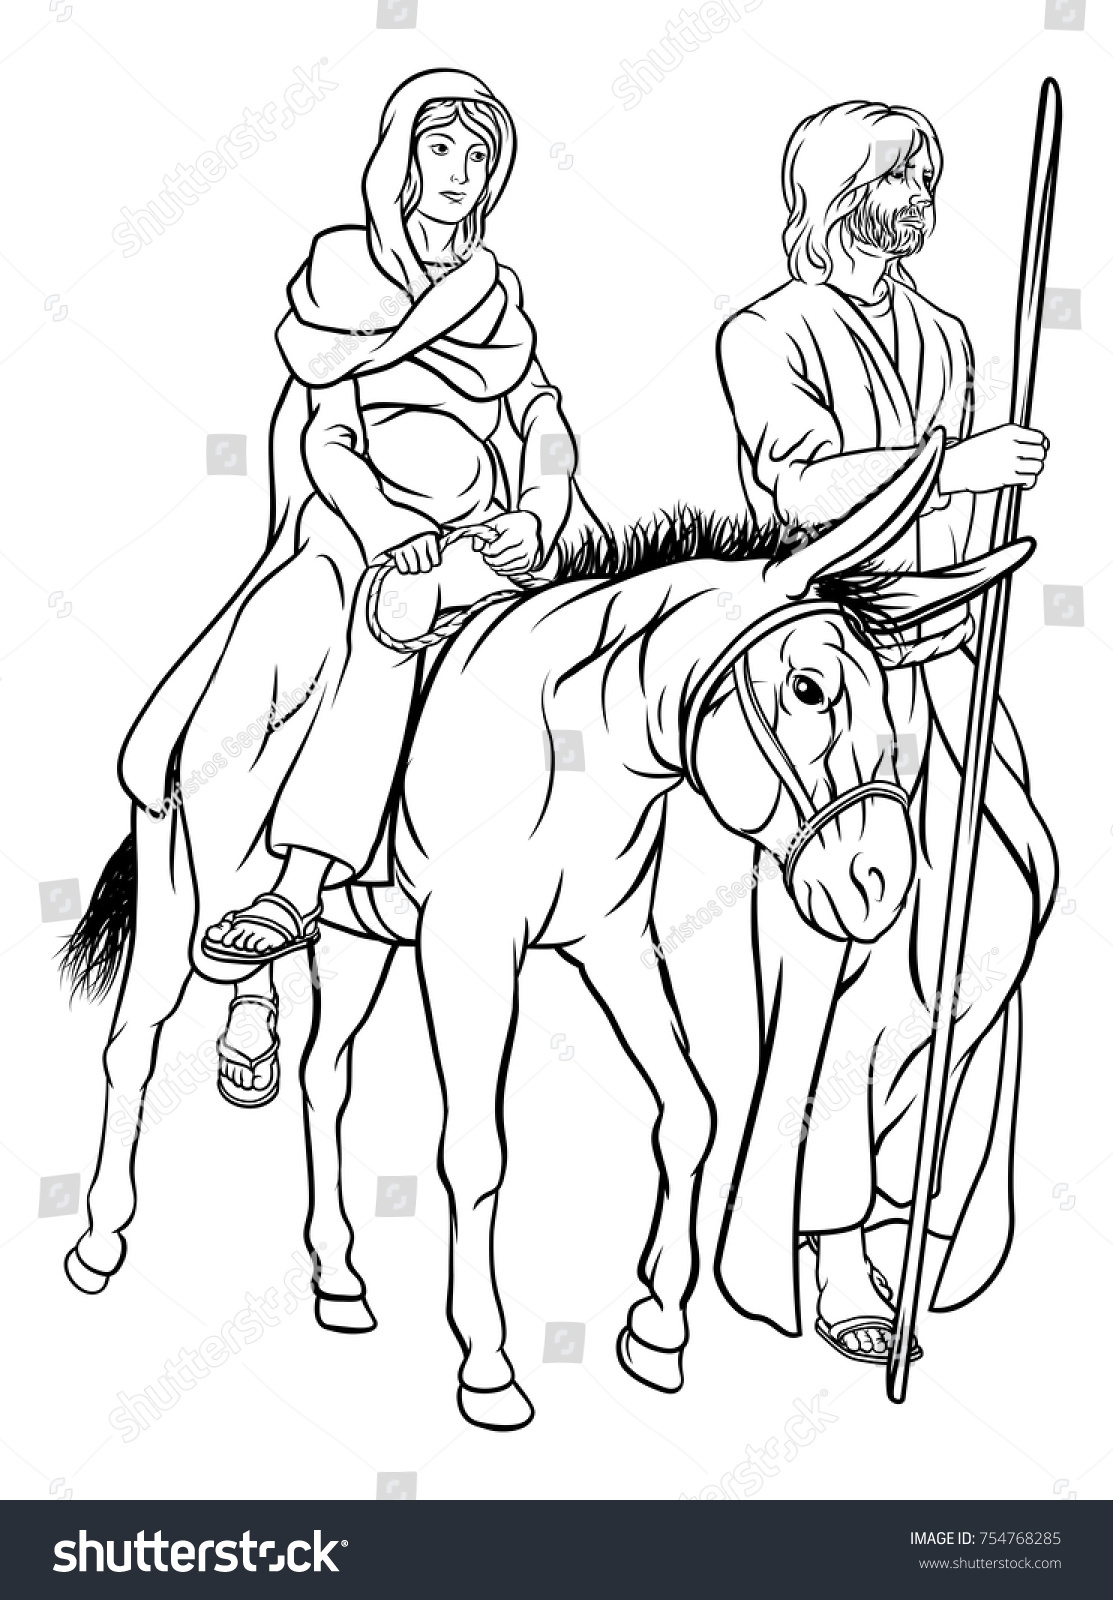 Religious Christian Nativity Christmas Illustration Joseph Stock ...